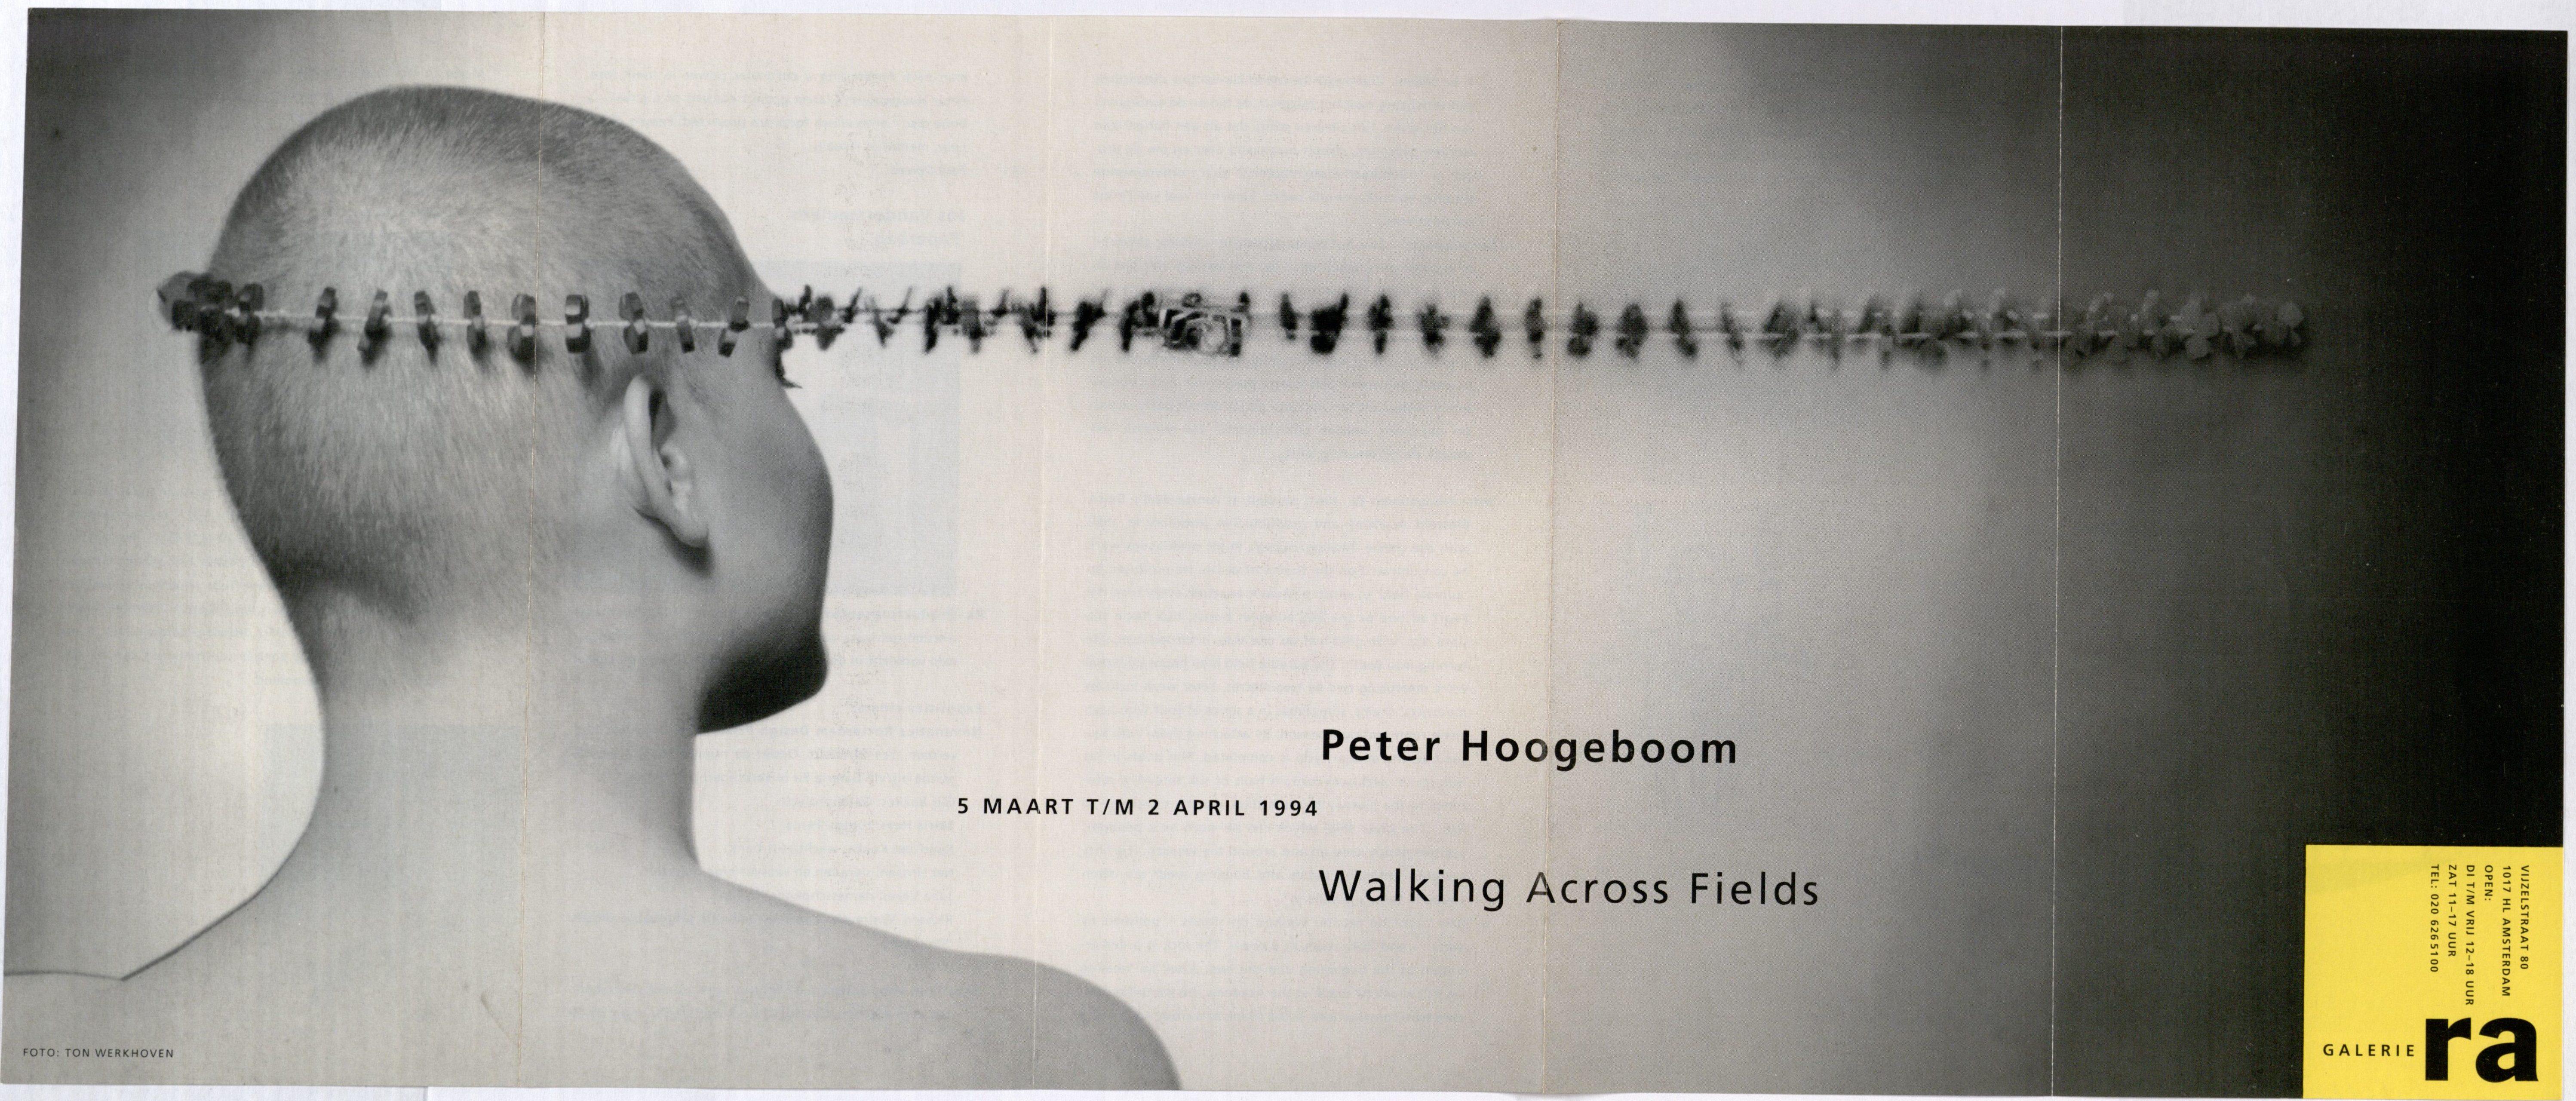 Ra Bulletin 81, februari 1994, voorzijde met foto van Ton Werkhoven met halssieraad van Peter Hoogeboom, drukwerk, papier